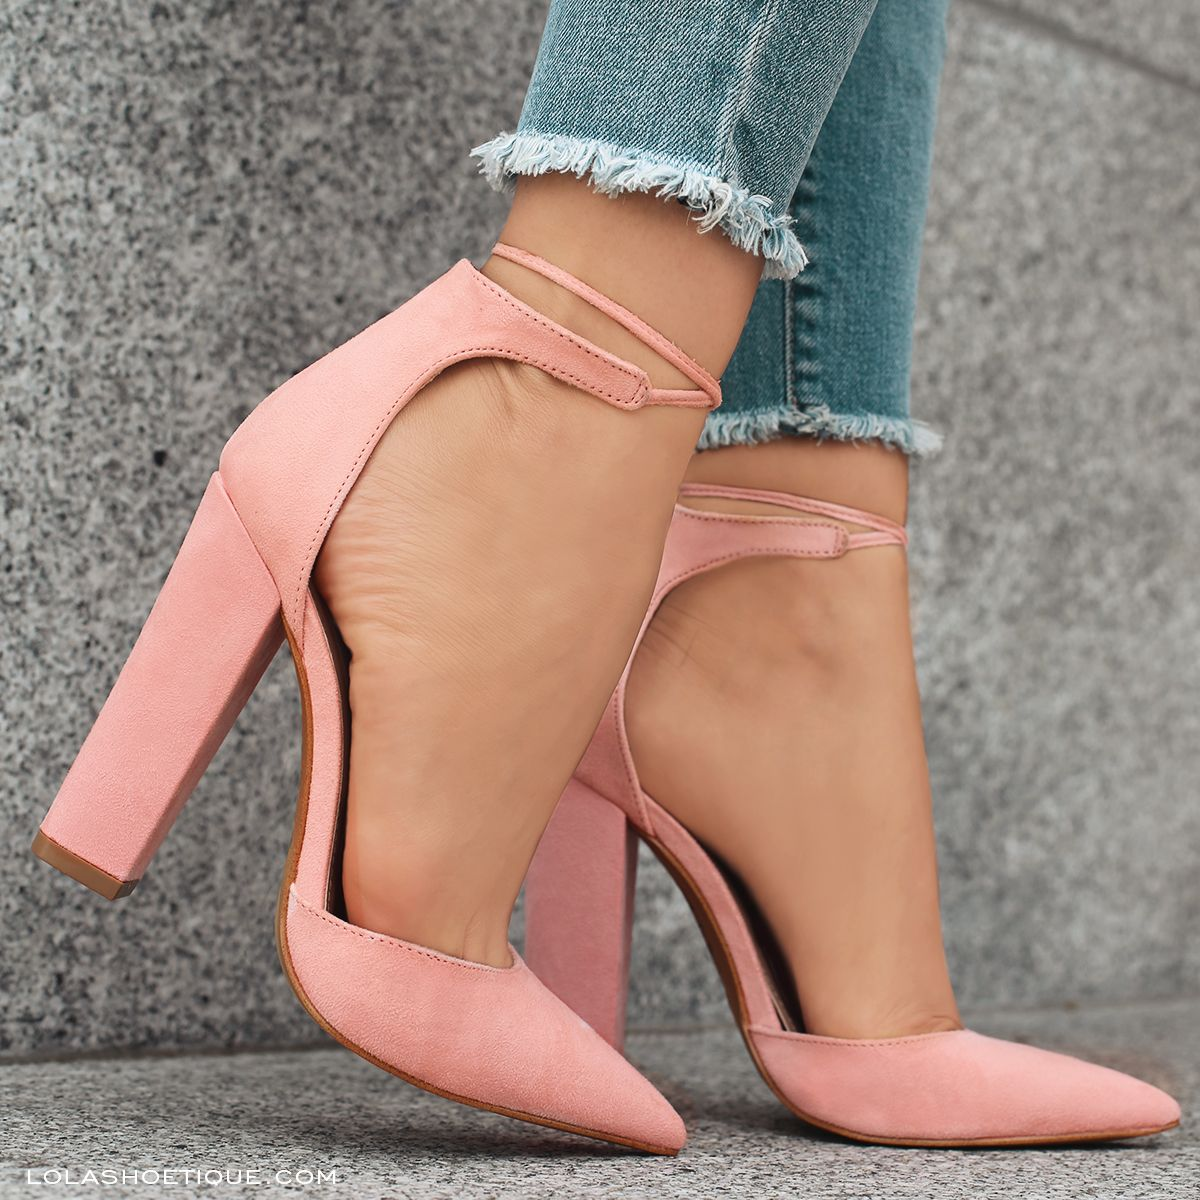 Cute Sexy Heels